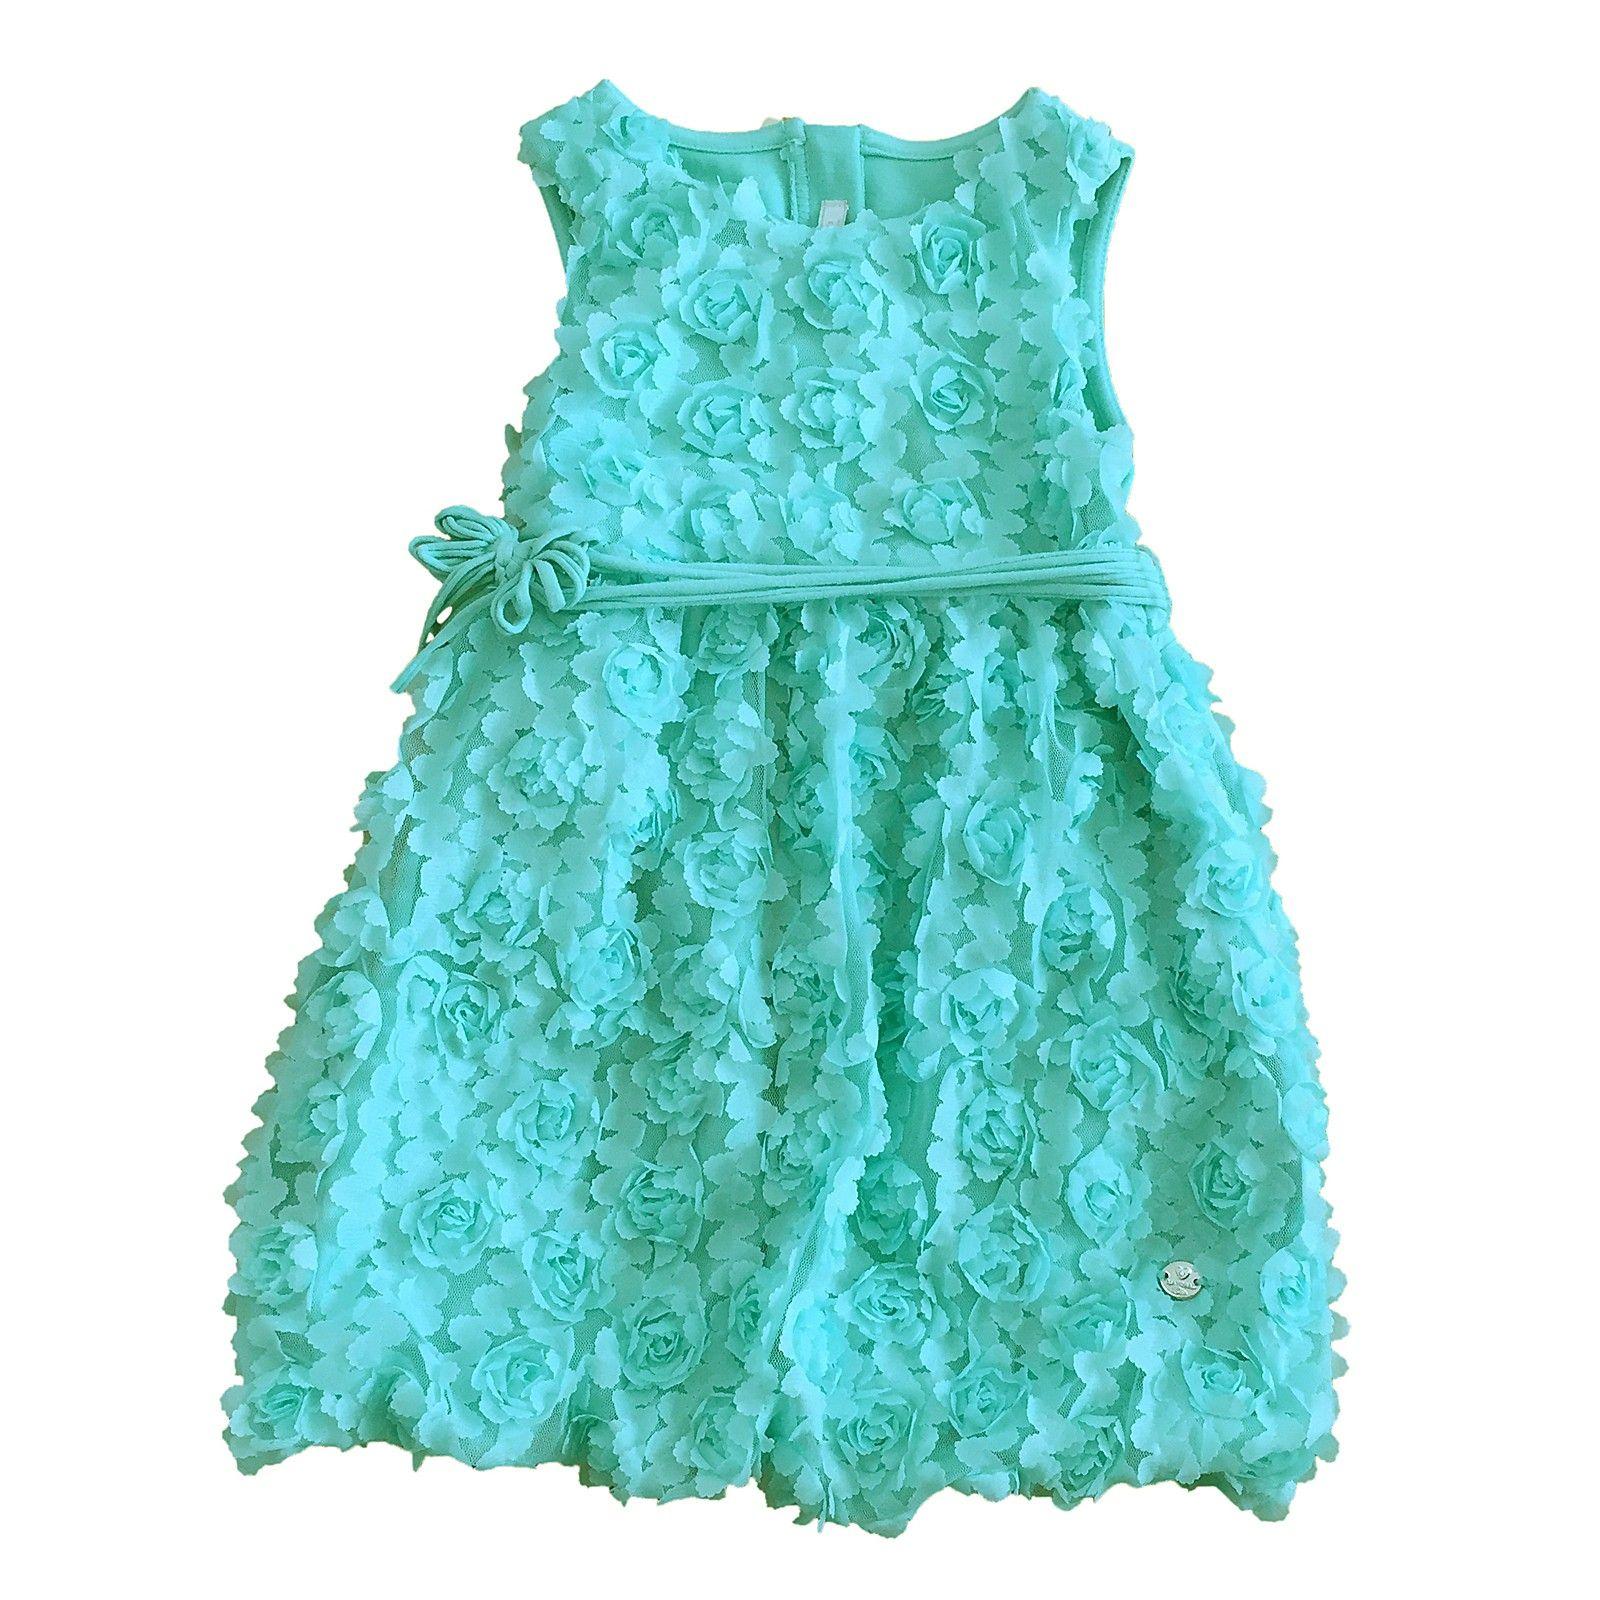 Vestiti Verde Tiffany Bambina.Vestito Cerimonia Tiffany Mayoral Bambina L Armadio Del